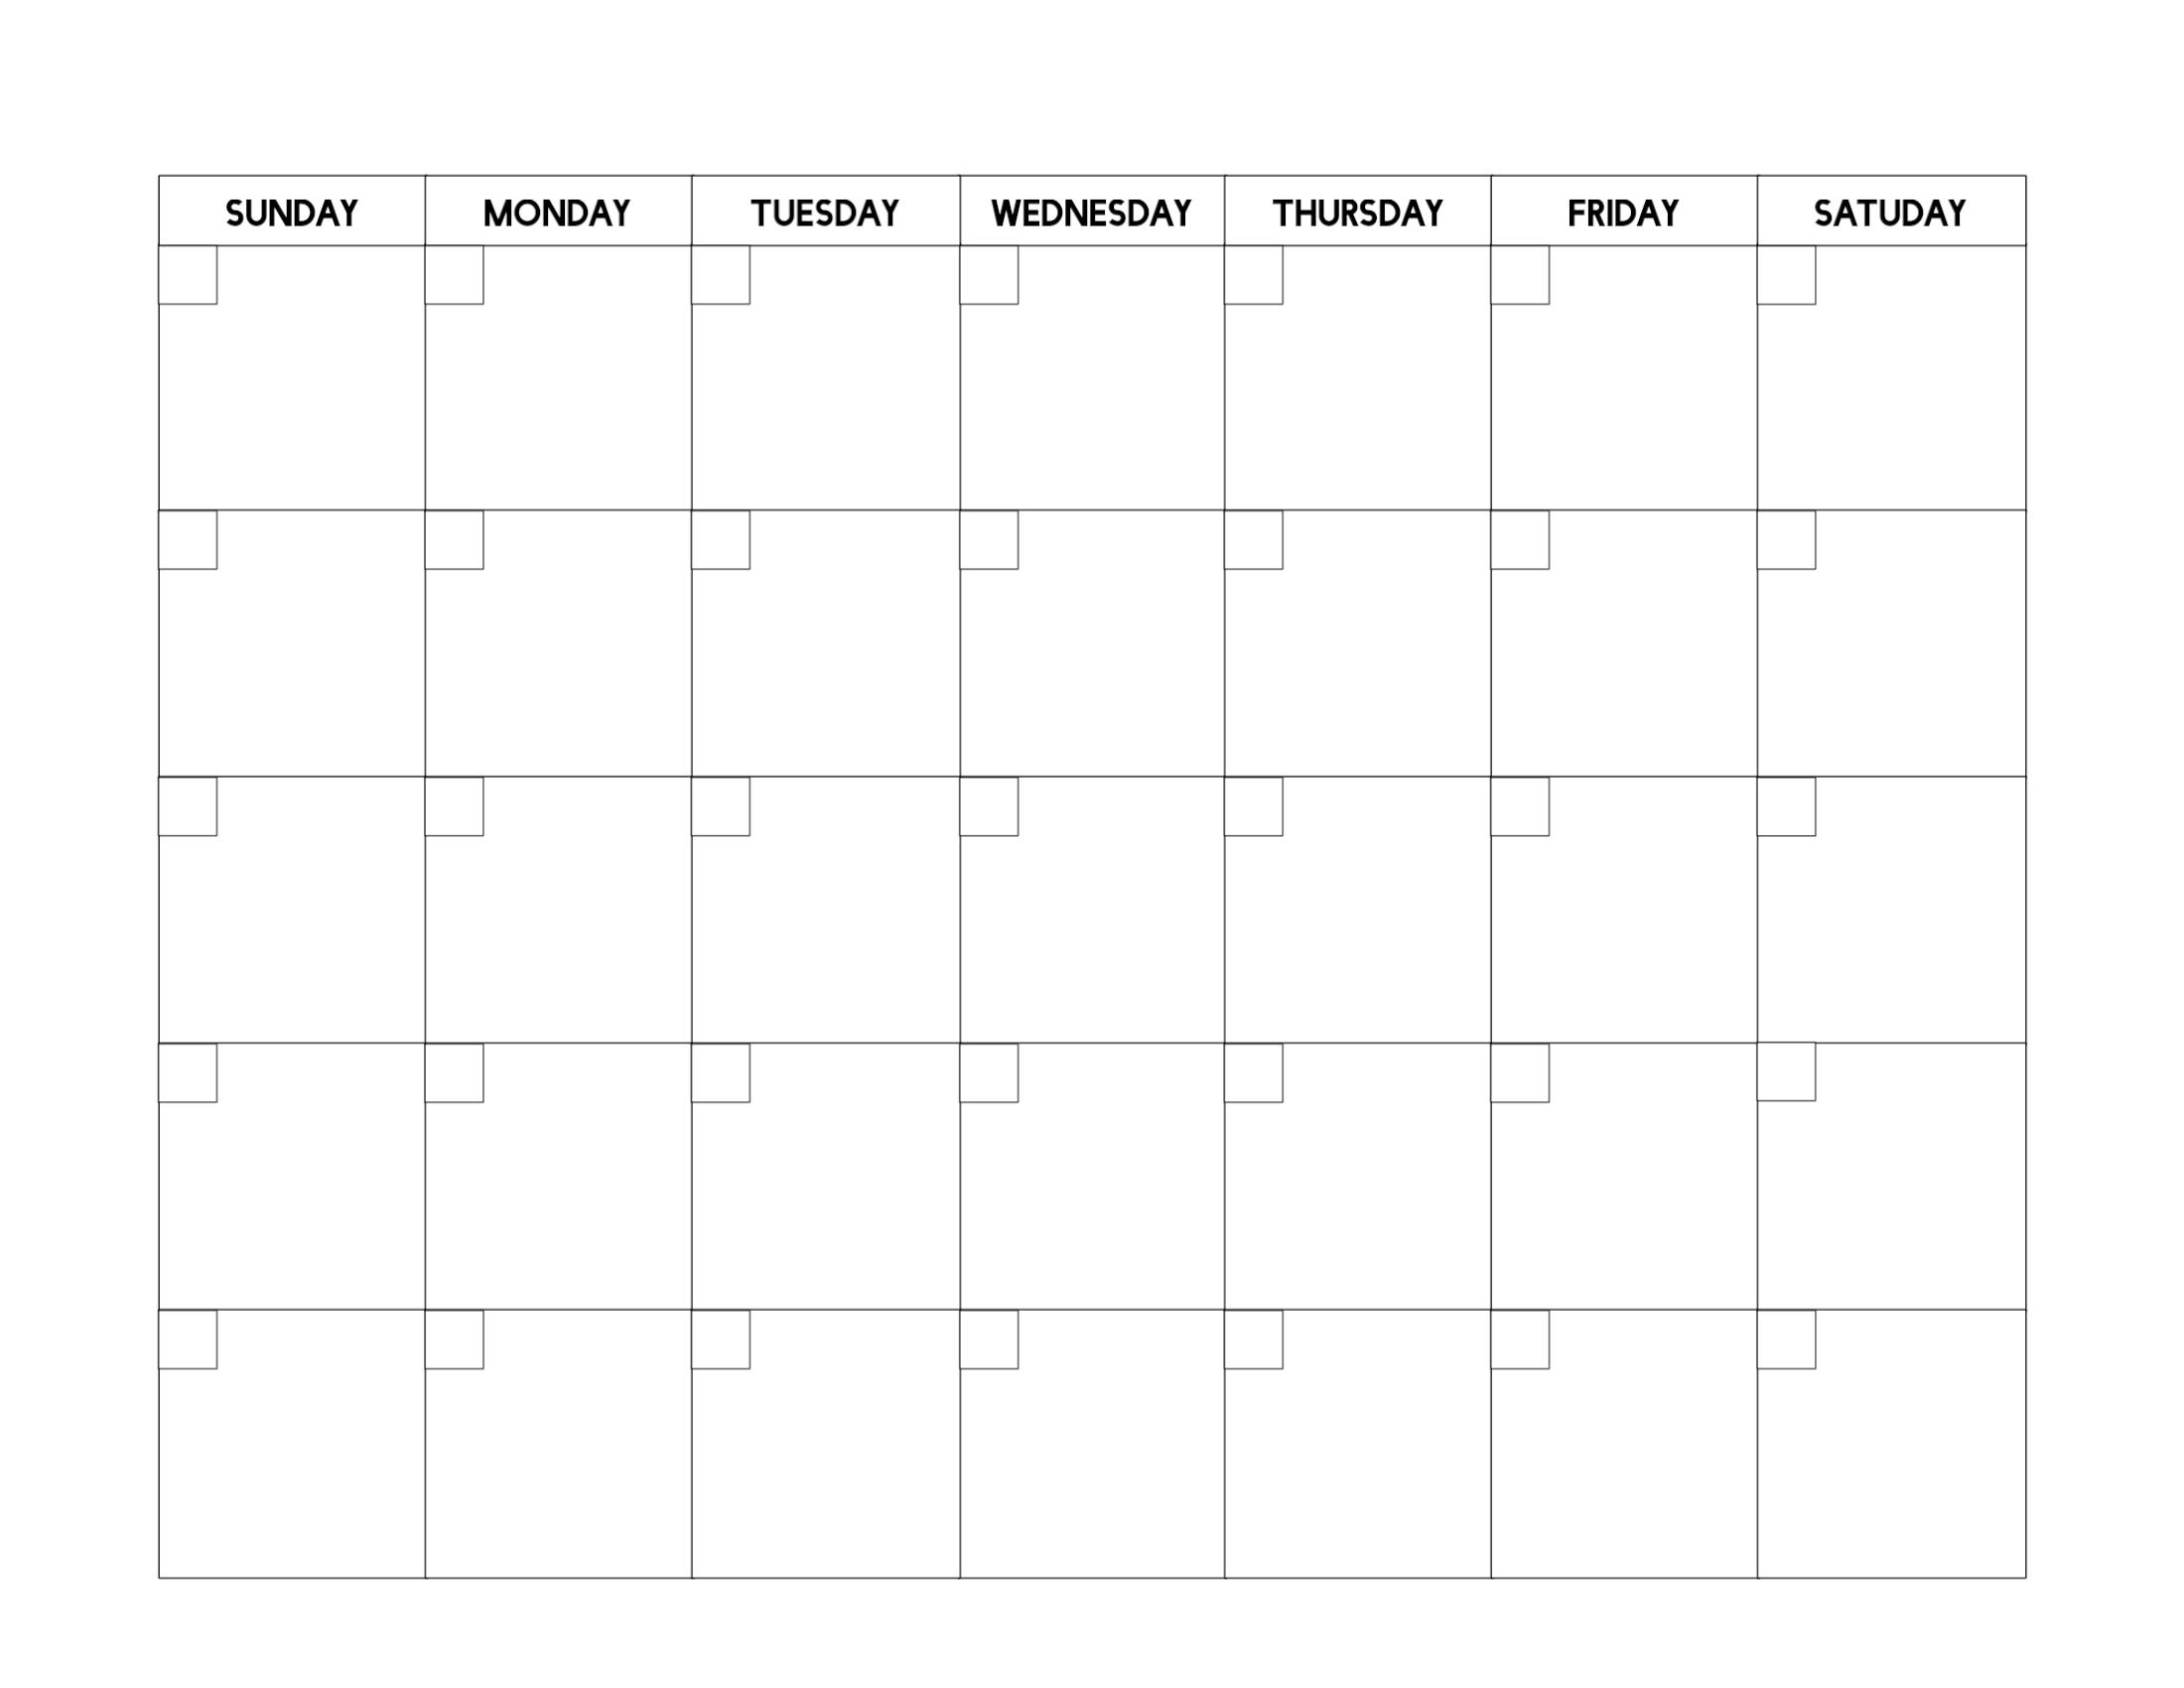 Free Printable Blank Calendar Template - Paper Trail Design  Free Printable Calendar Templates